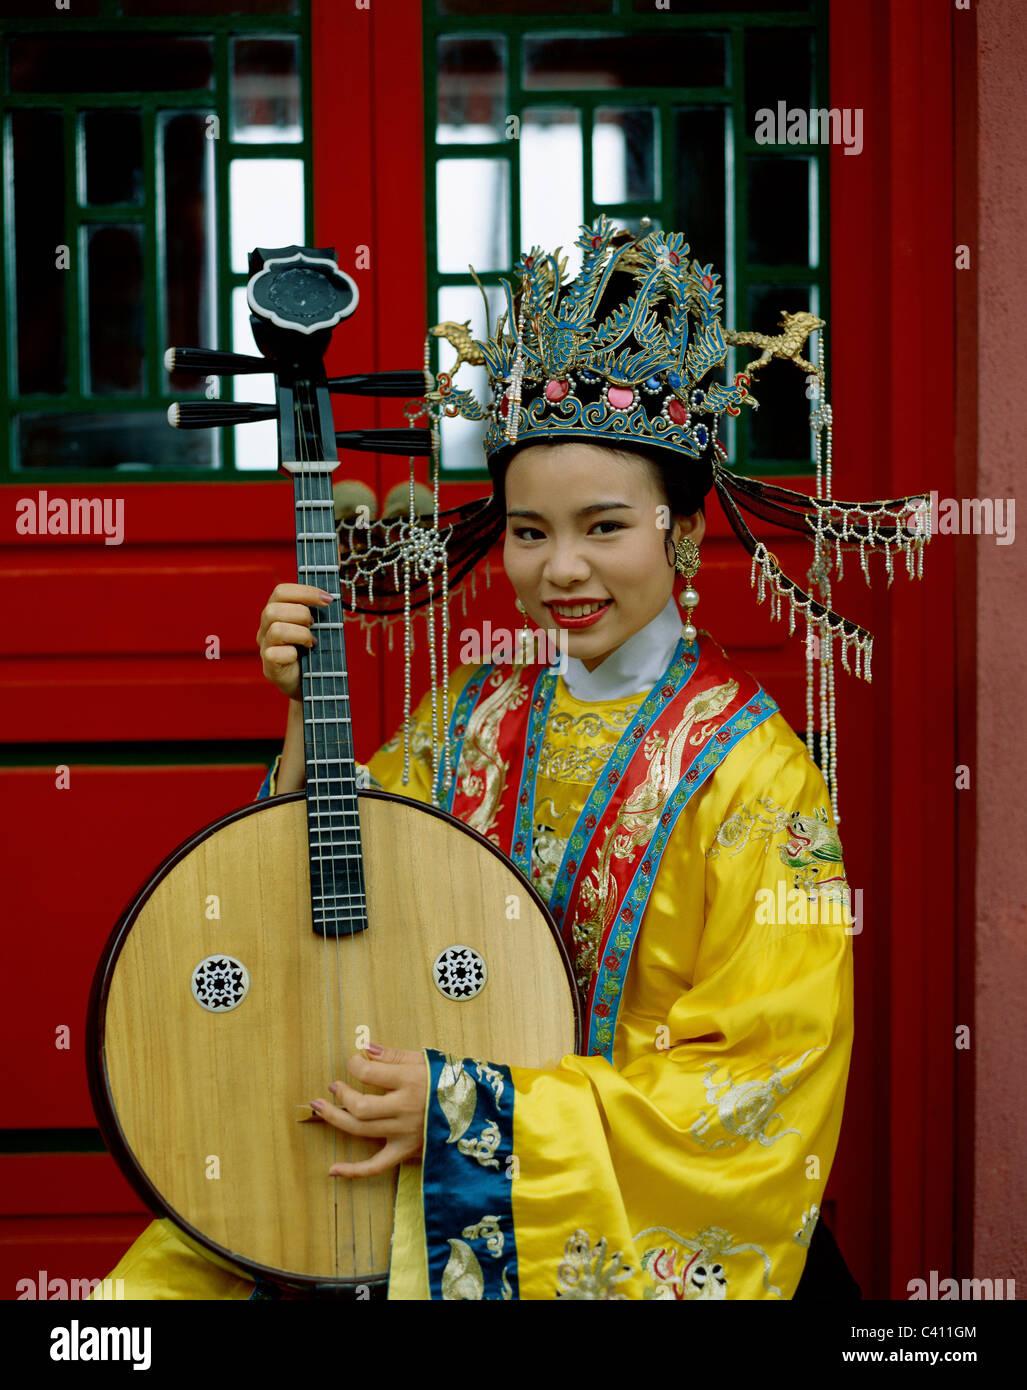 Asia, Beijing, Peking, China, Holiday, Instrument, Landmark, Lute, Model, Musical, Playing, Released, String, Three, - Stock Image